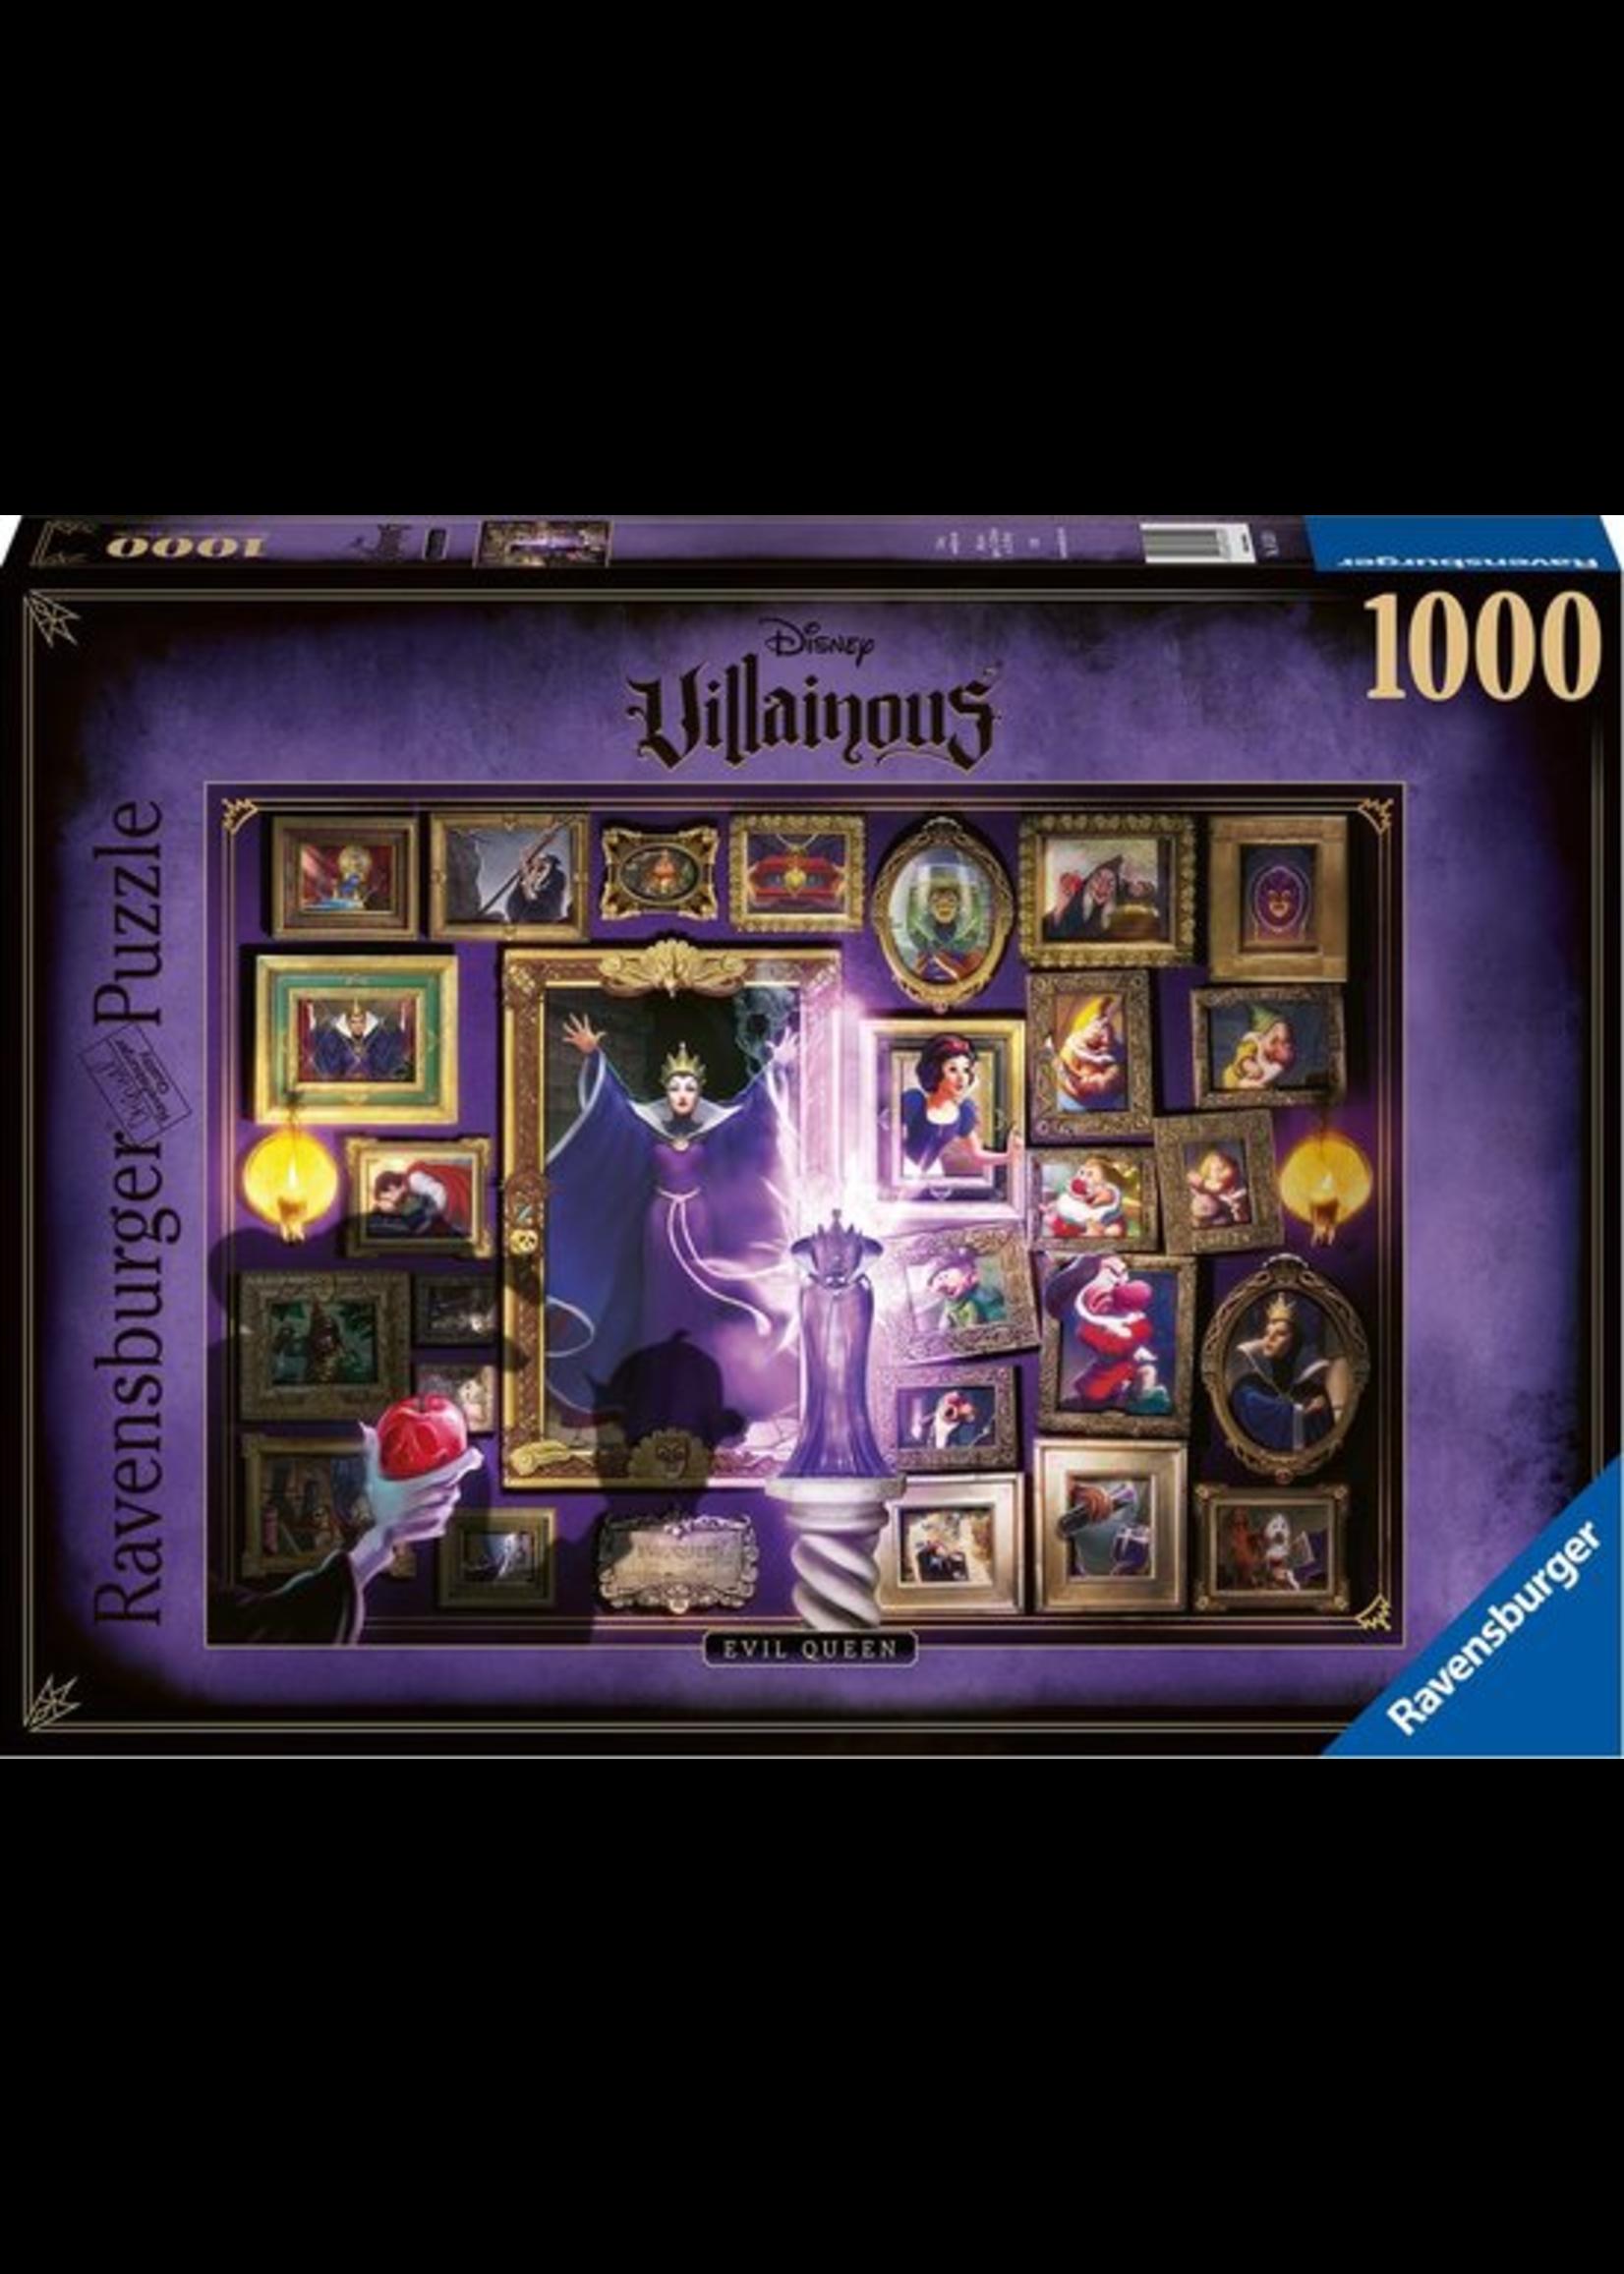 Disney Villainous - Evil Queen (1000)